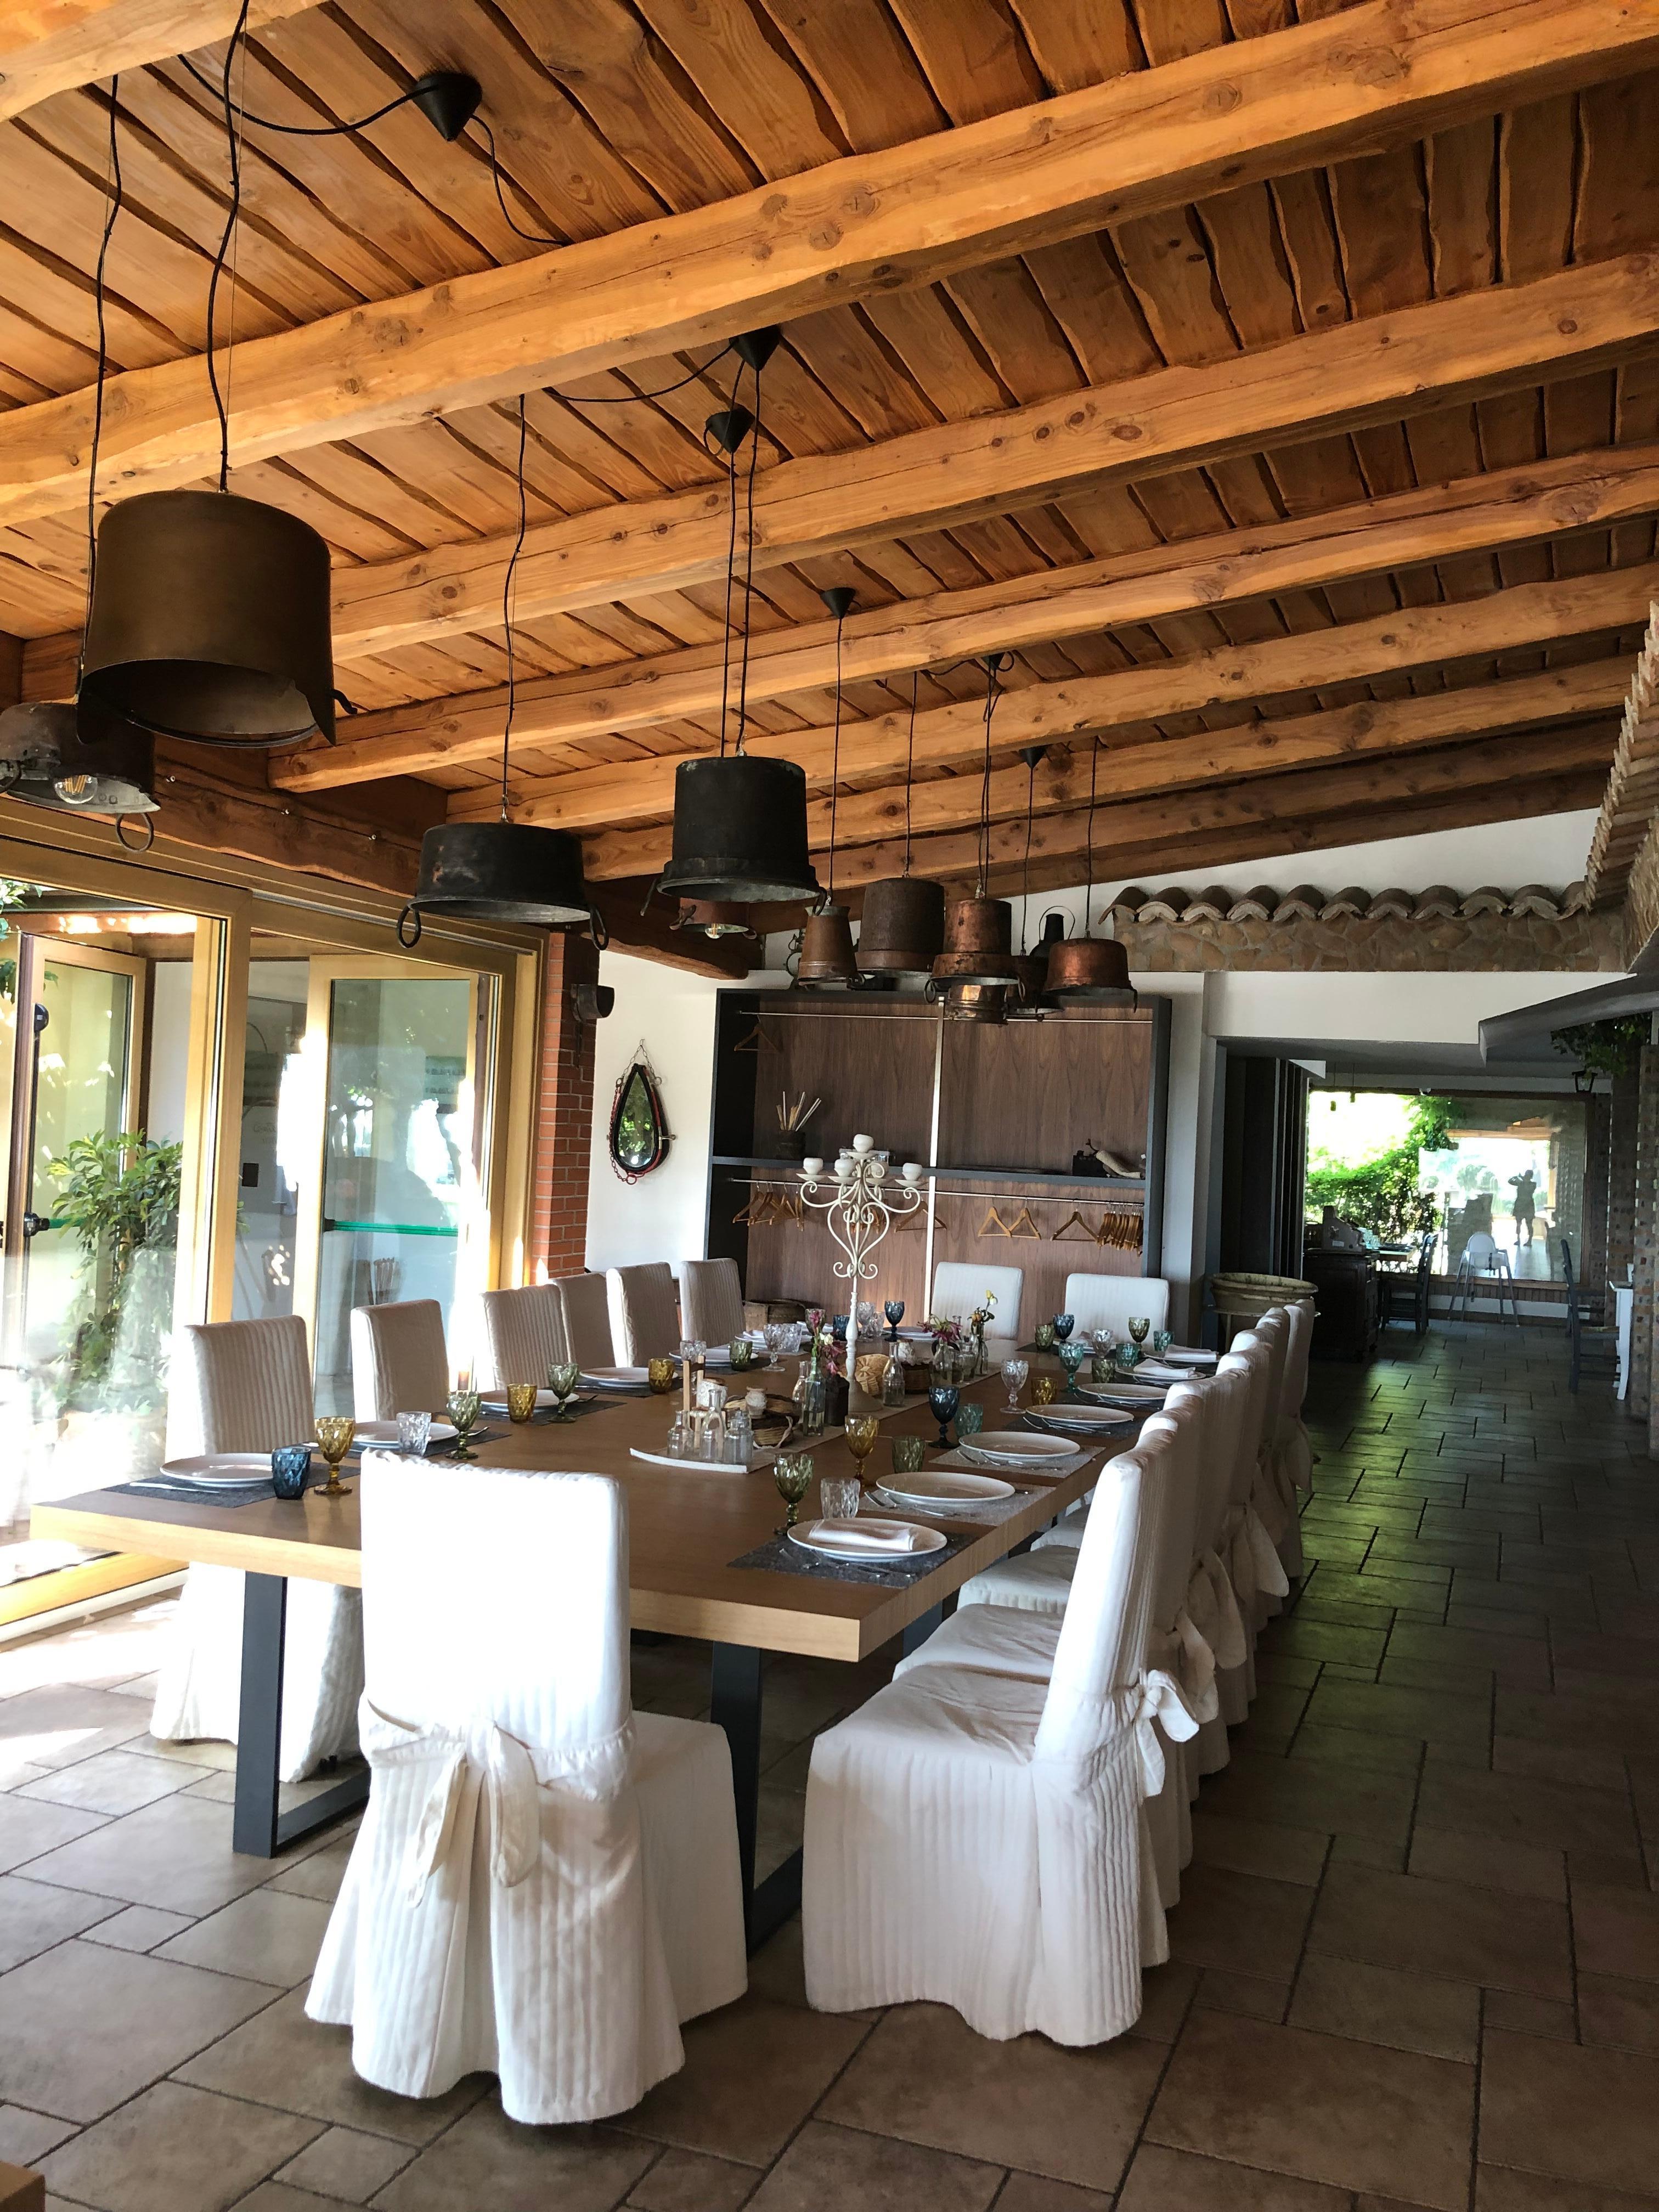 Tenuta Contessa Relais Country House tenuta contessa lattarico, ita - best price guarantee